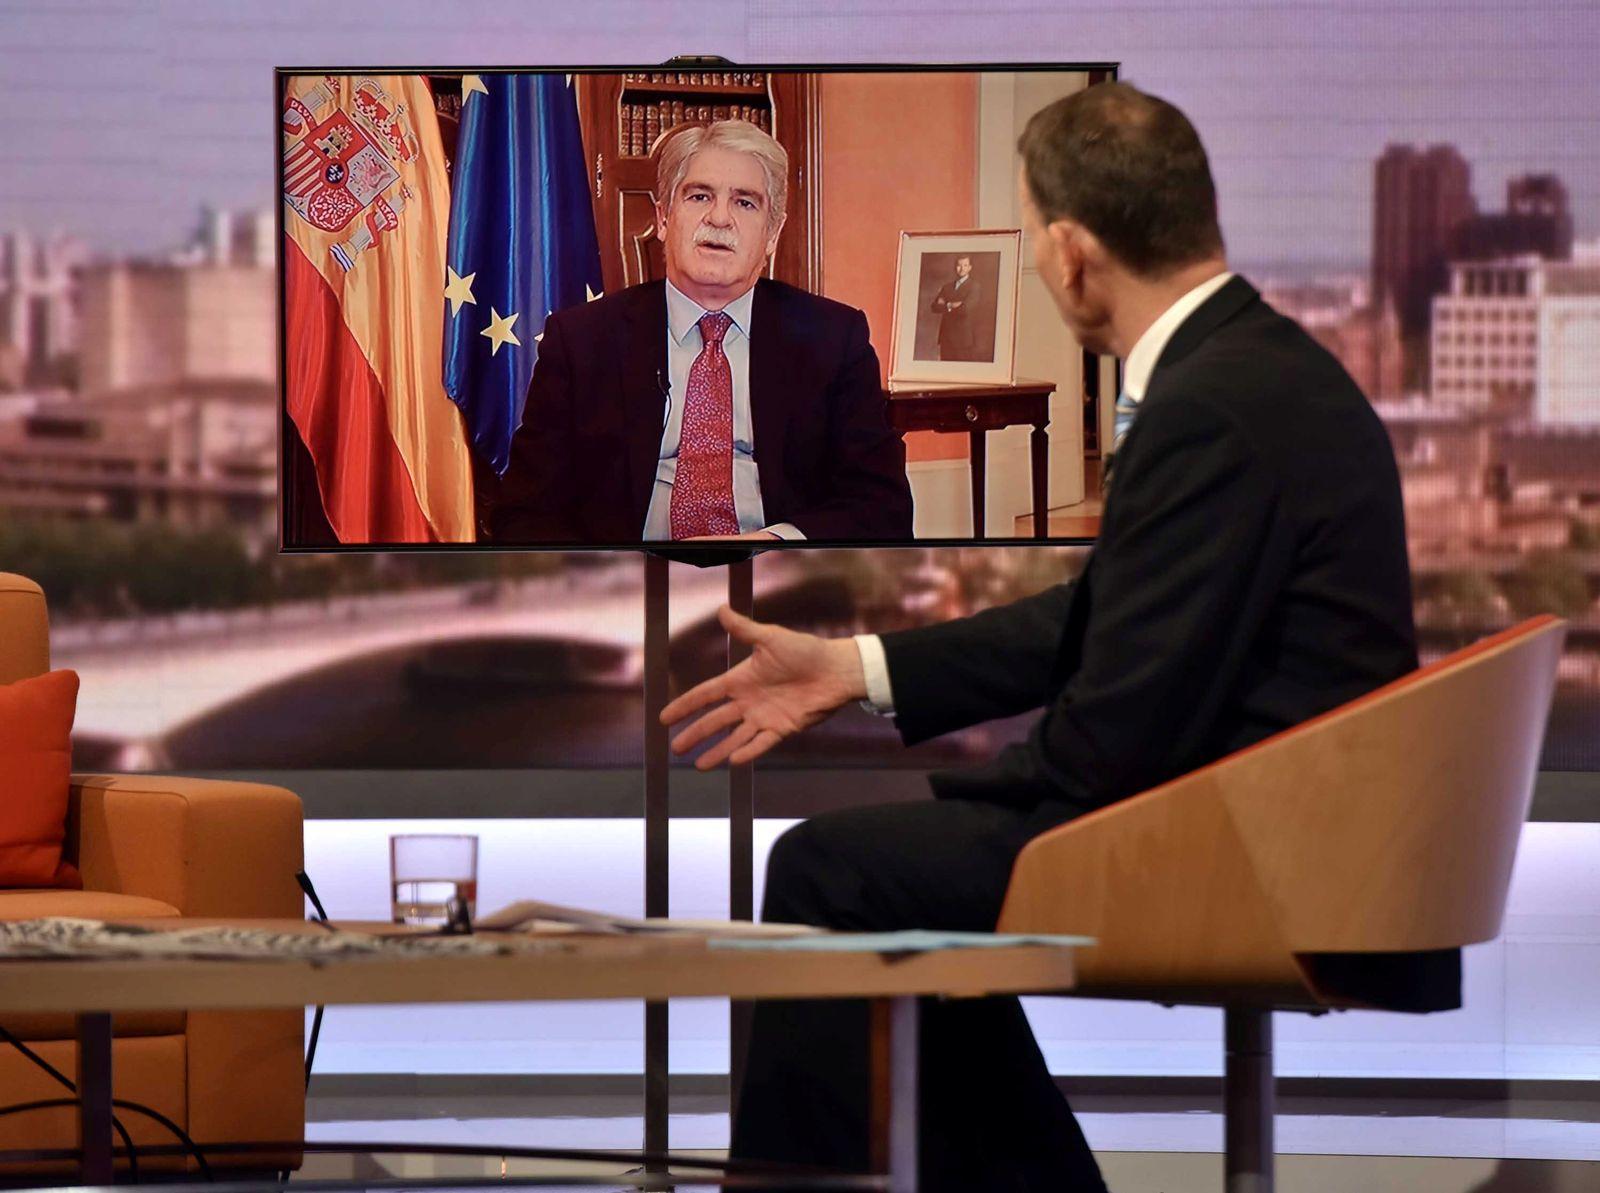 BBC Alfonso Dastis